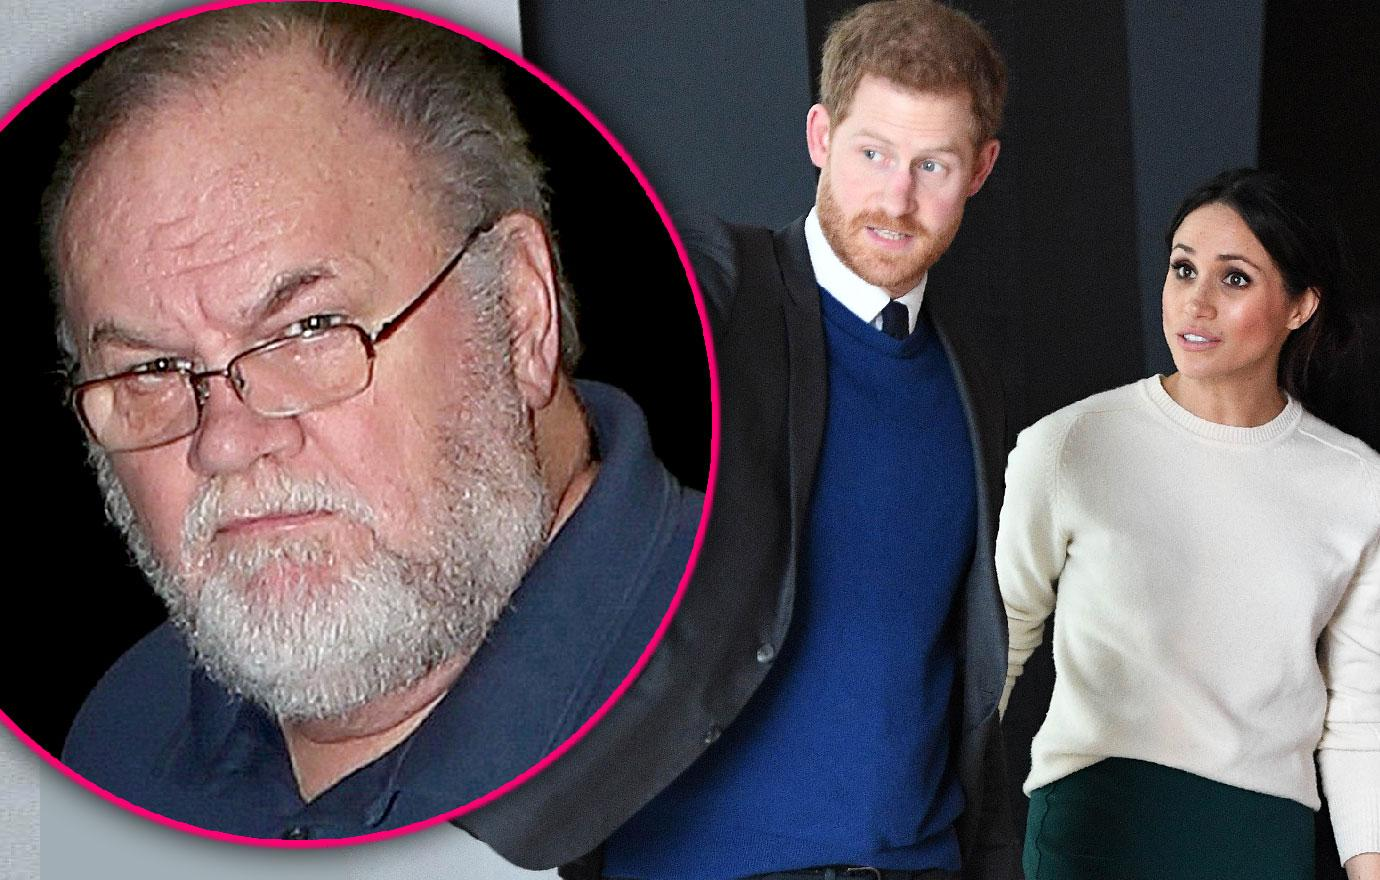 Prince Harry Calls Meghan Markle's Reclusive Dad Often